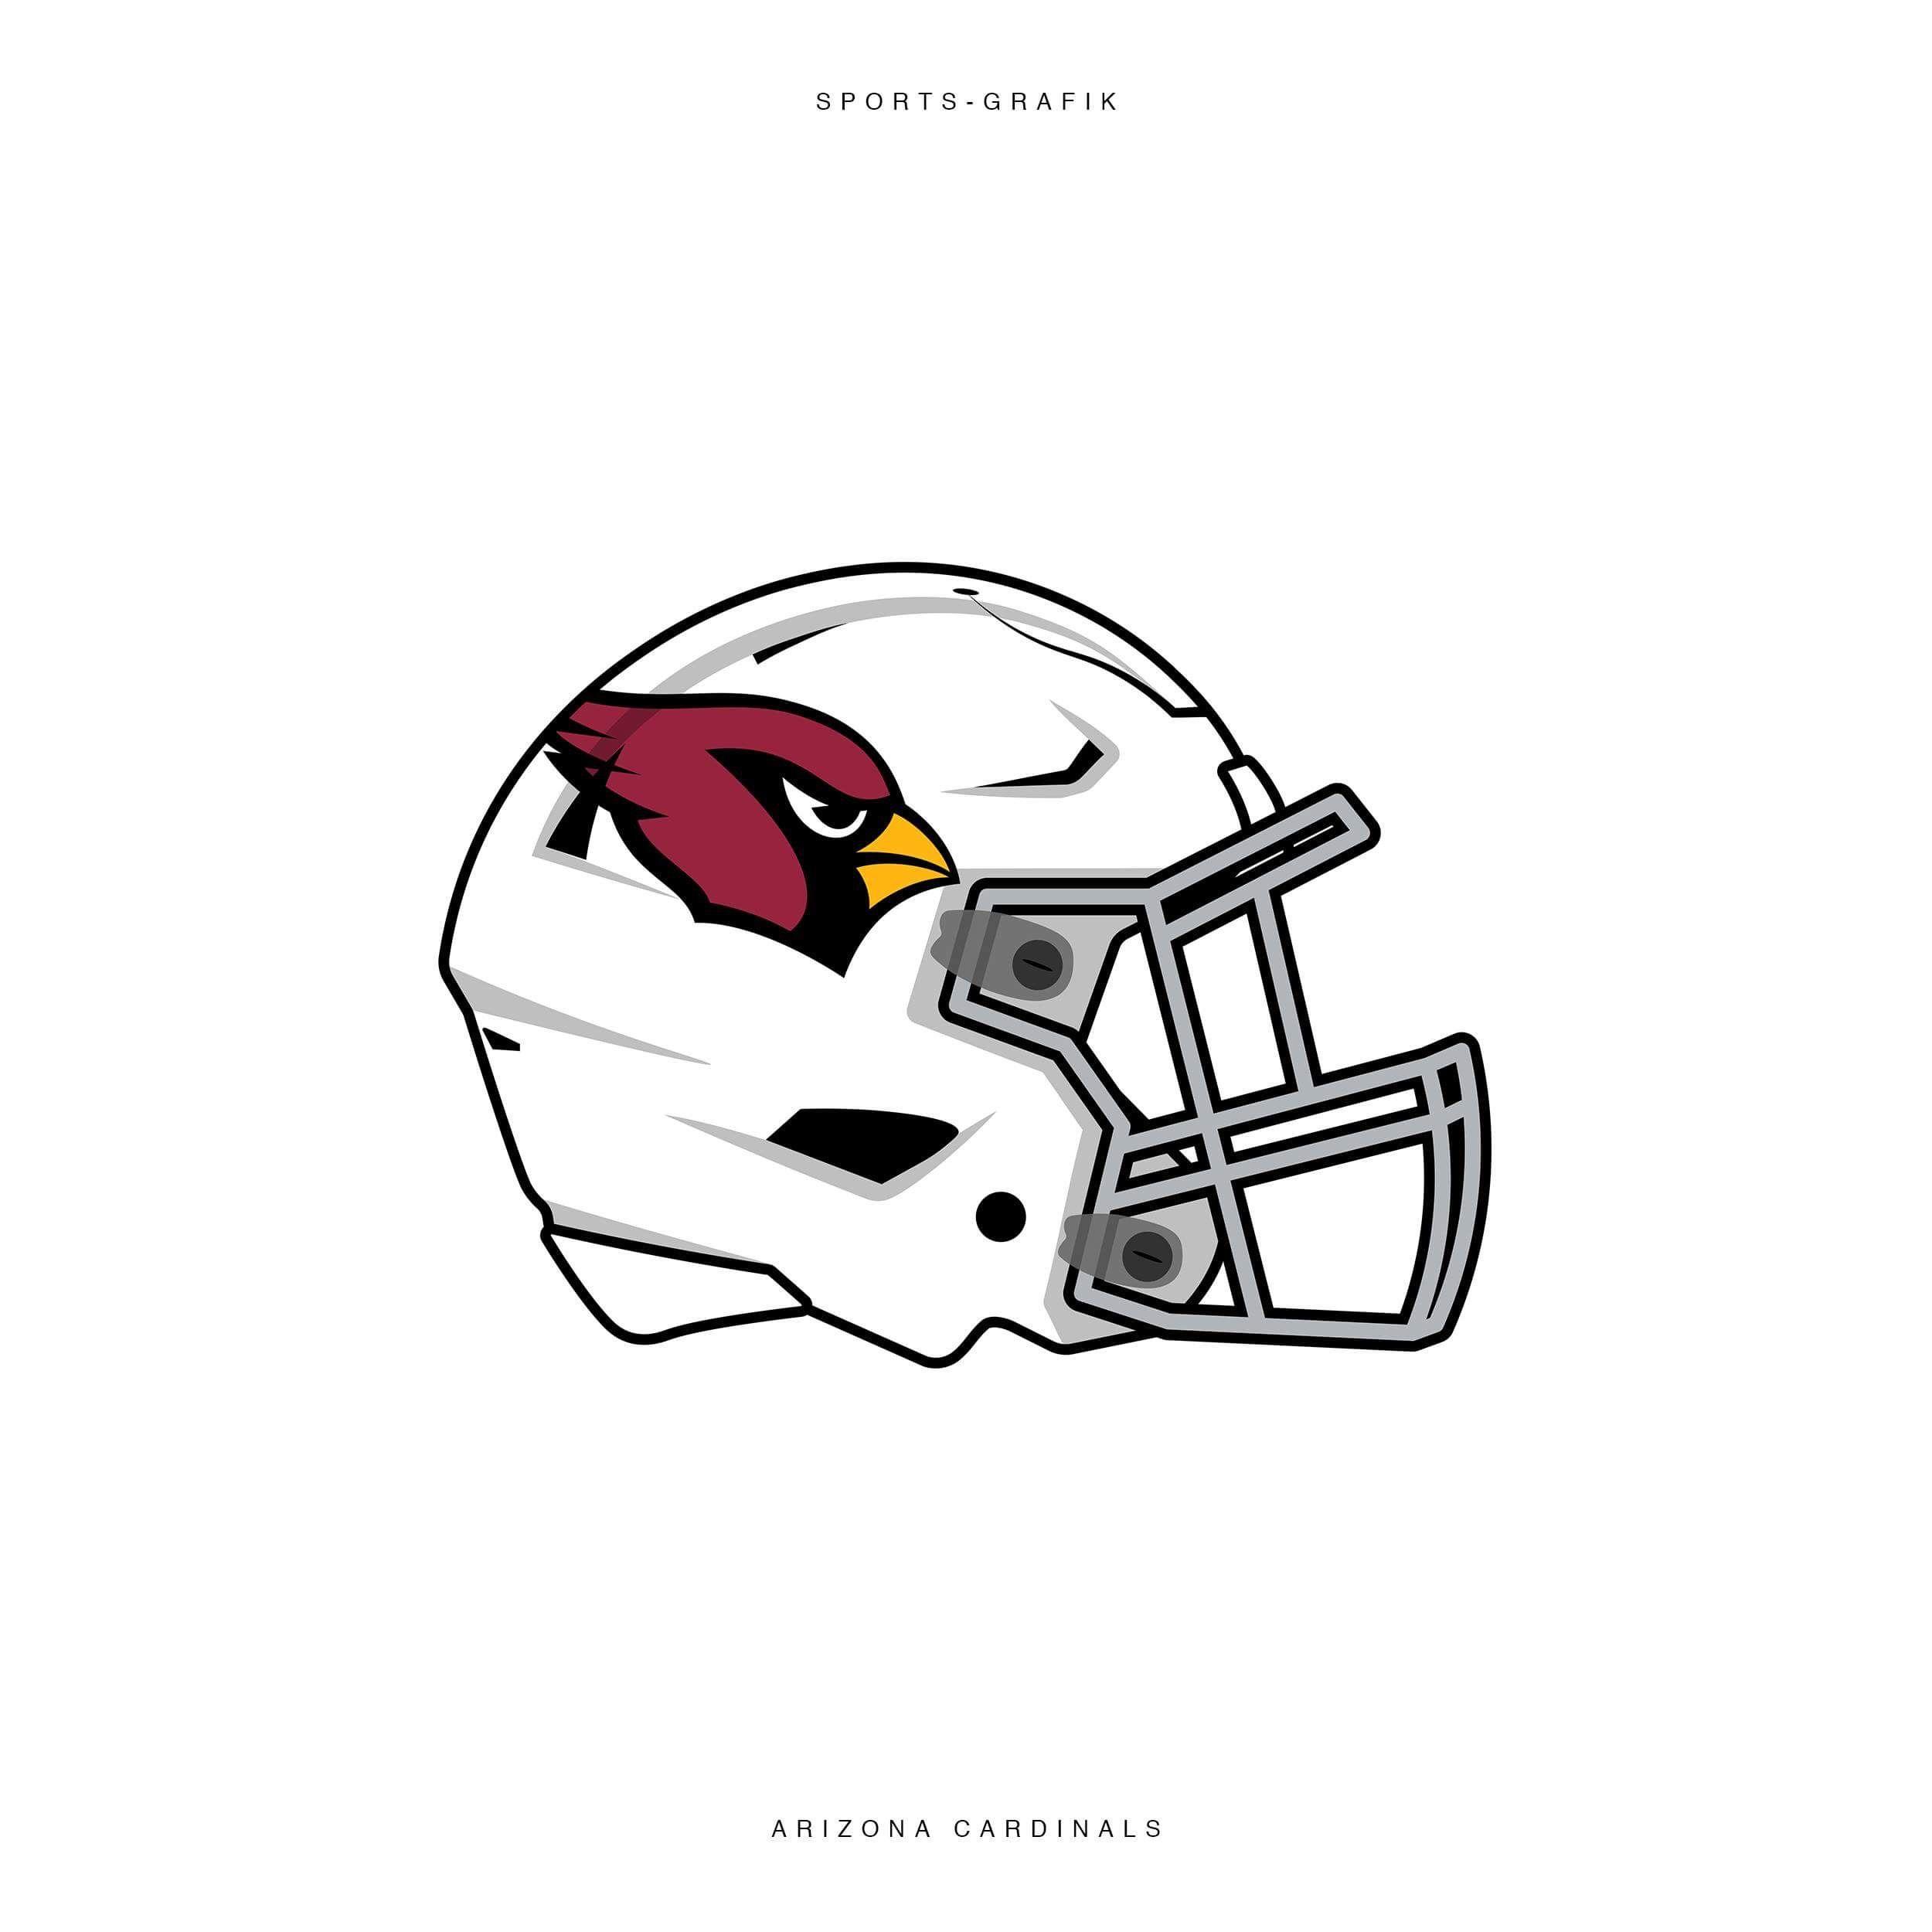 Arizona Cardinals Helmet Fanart Nfl American Football